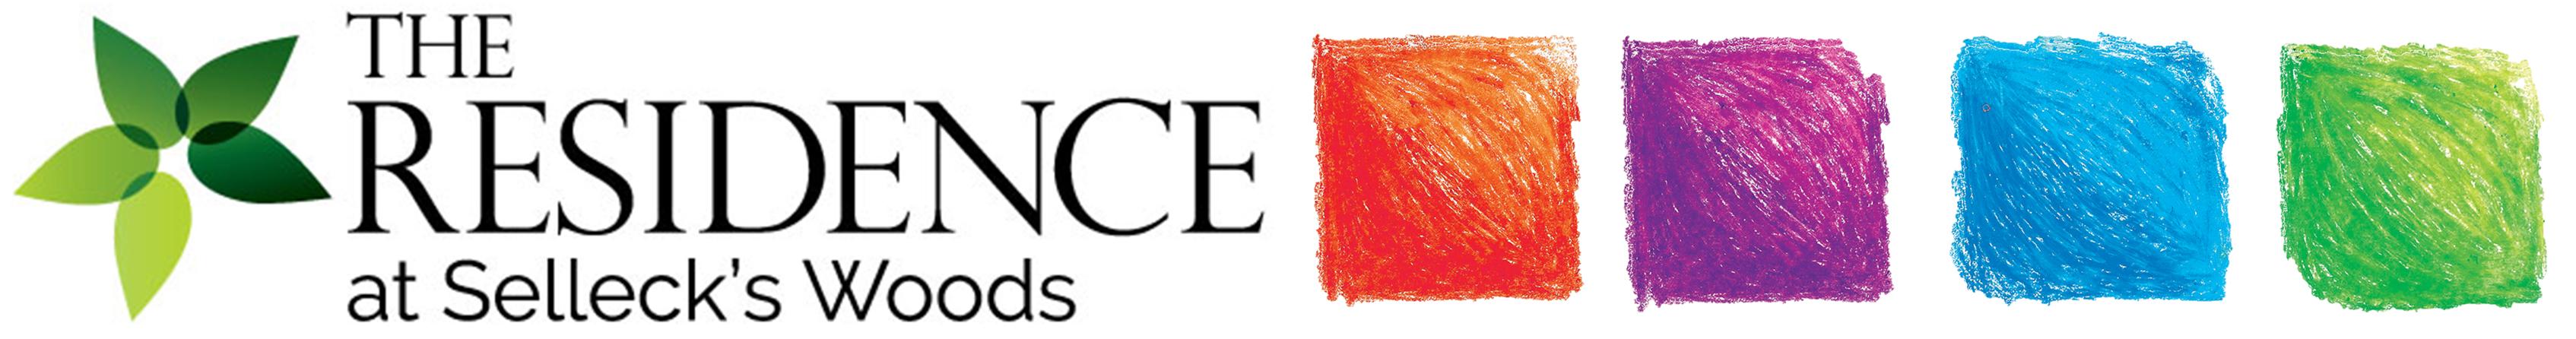 LCB-Logos_0006_Sellecks-1